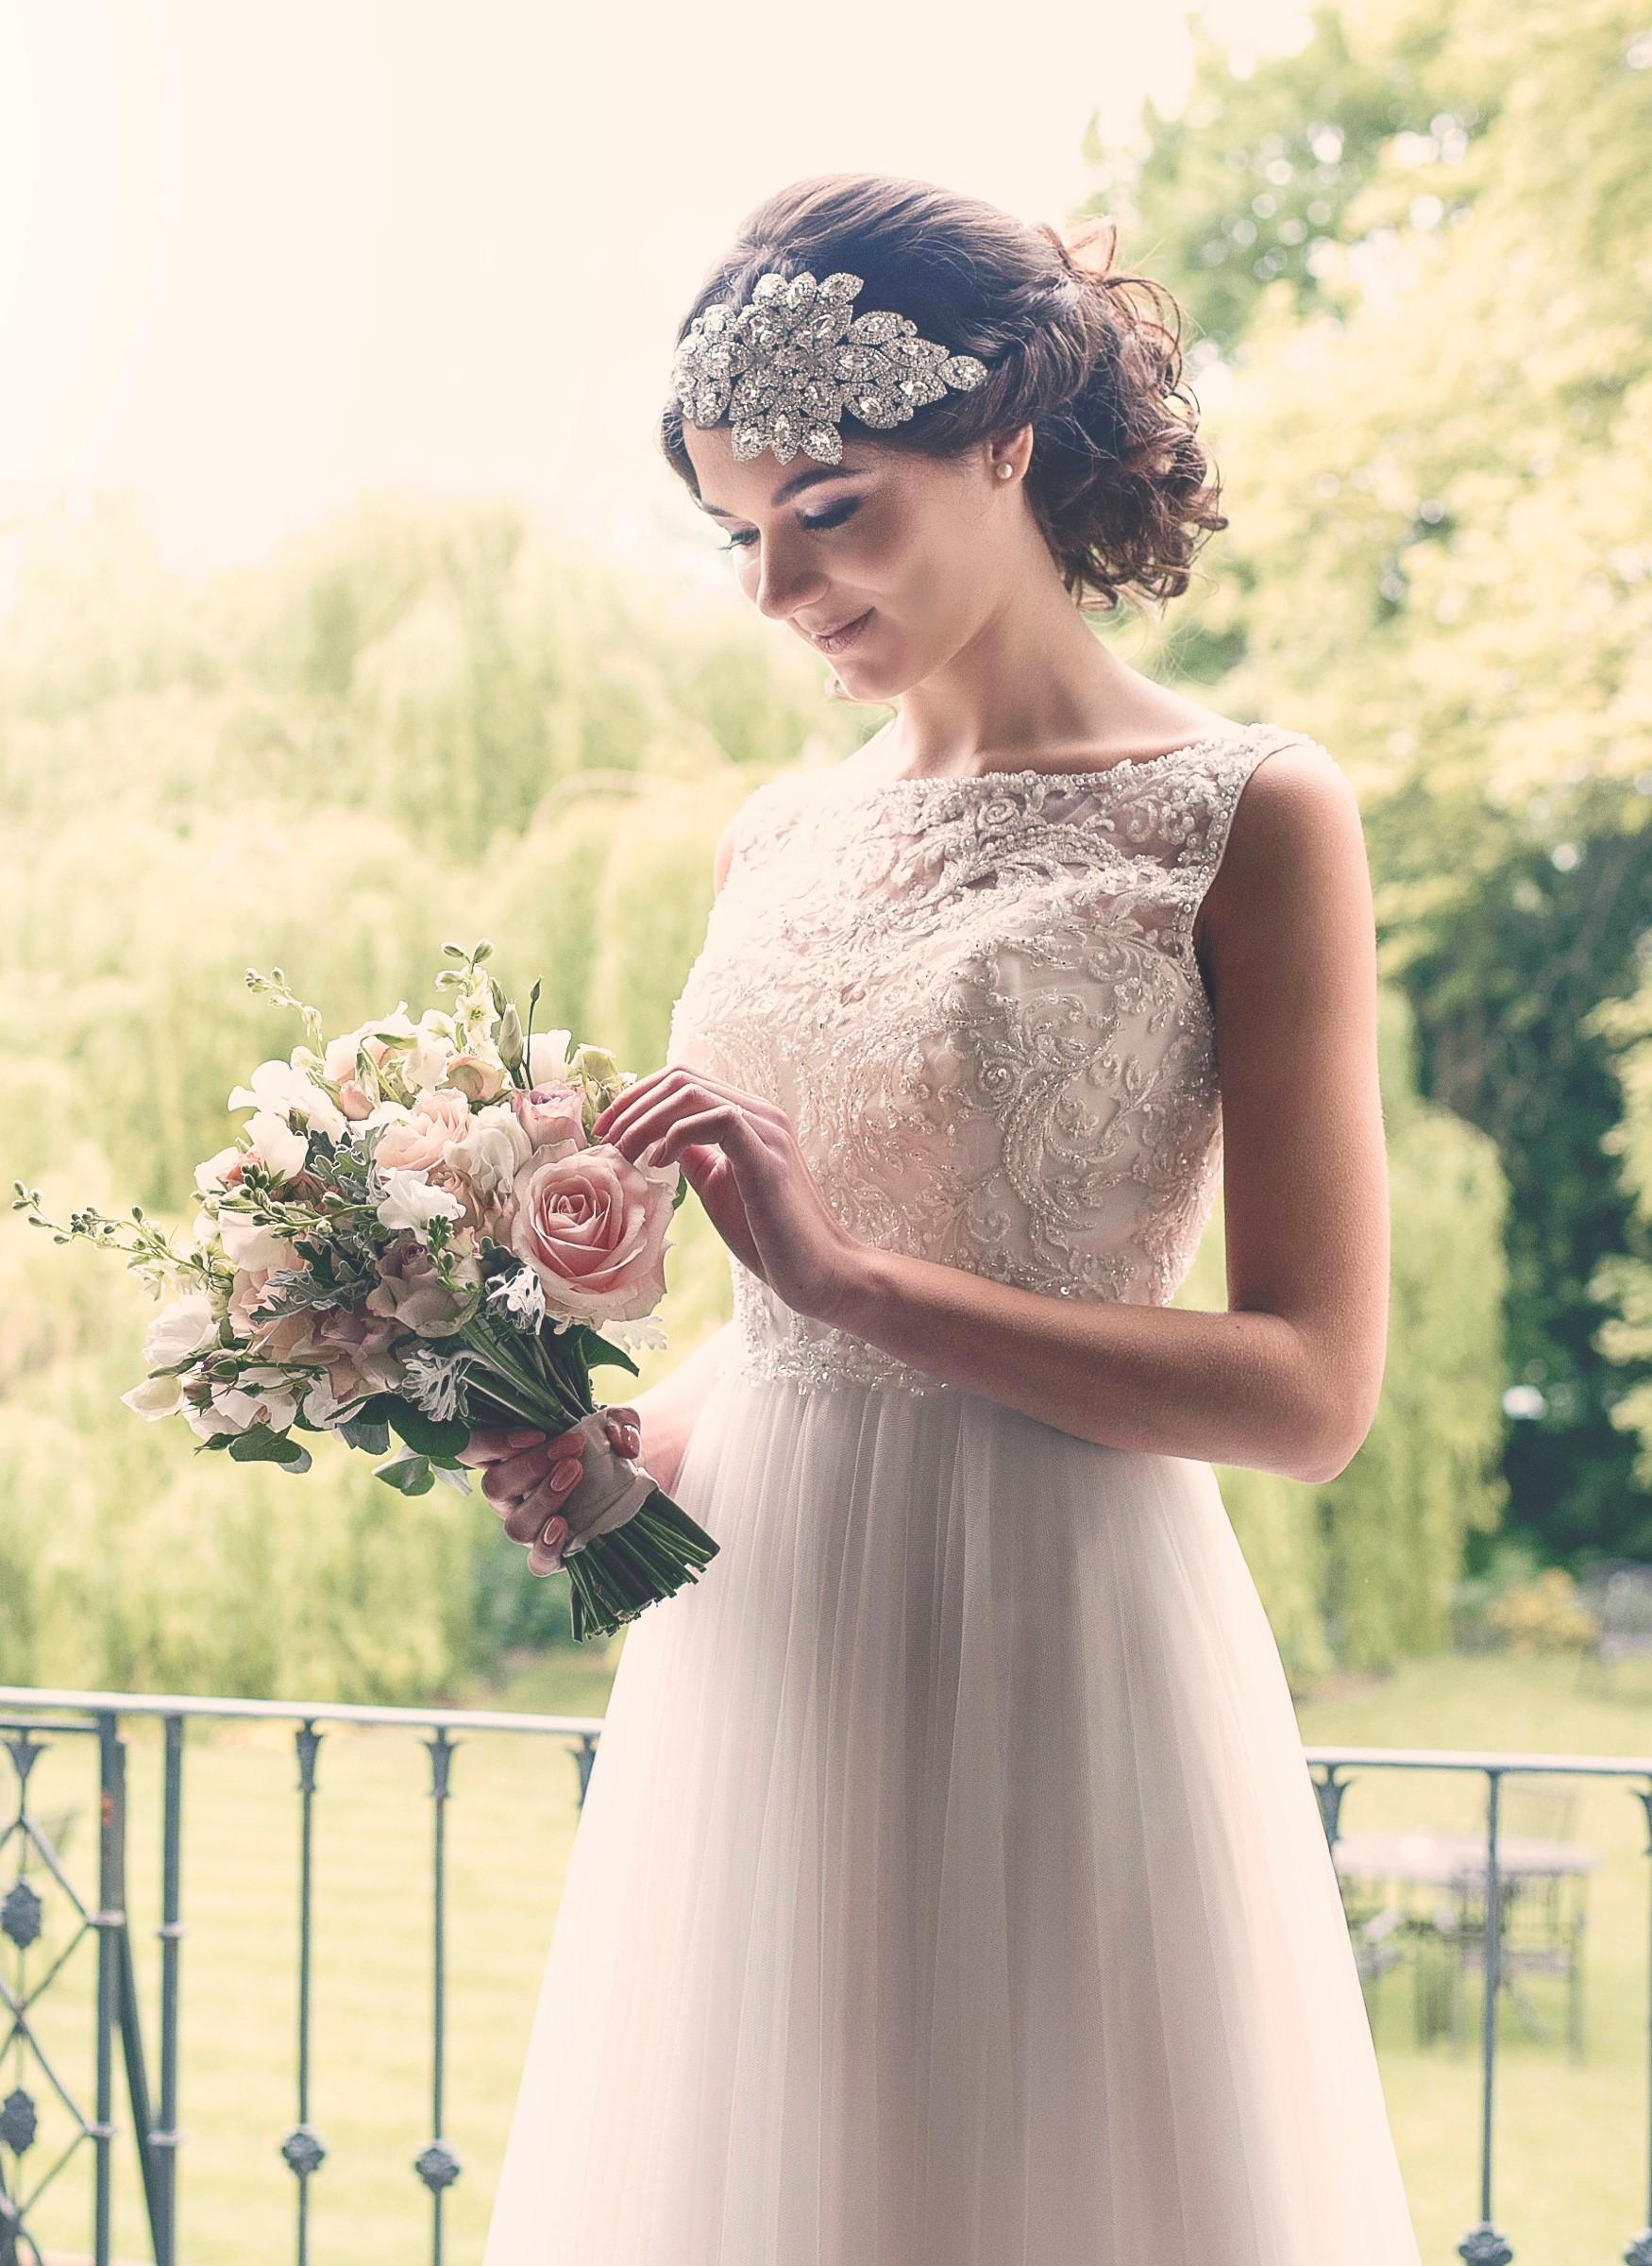 Shine-Model-Leeds-Harrogate-bridal-Suzannah-02-2.jpg#asset:44793